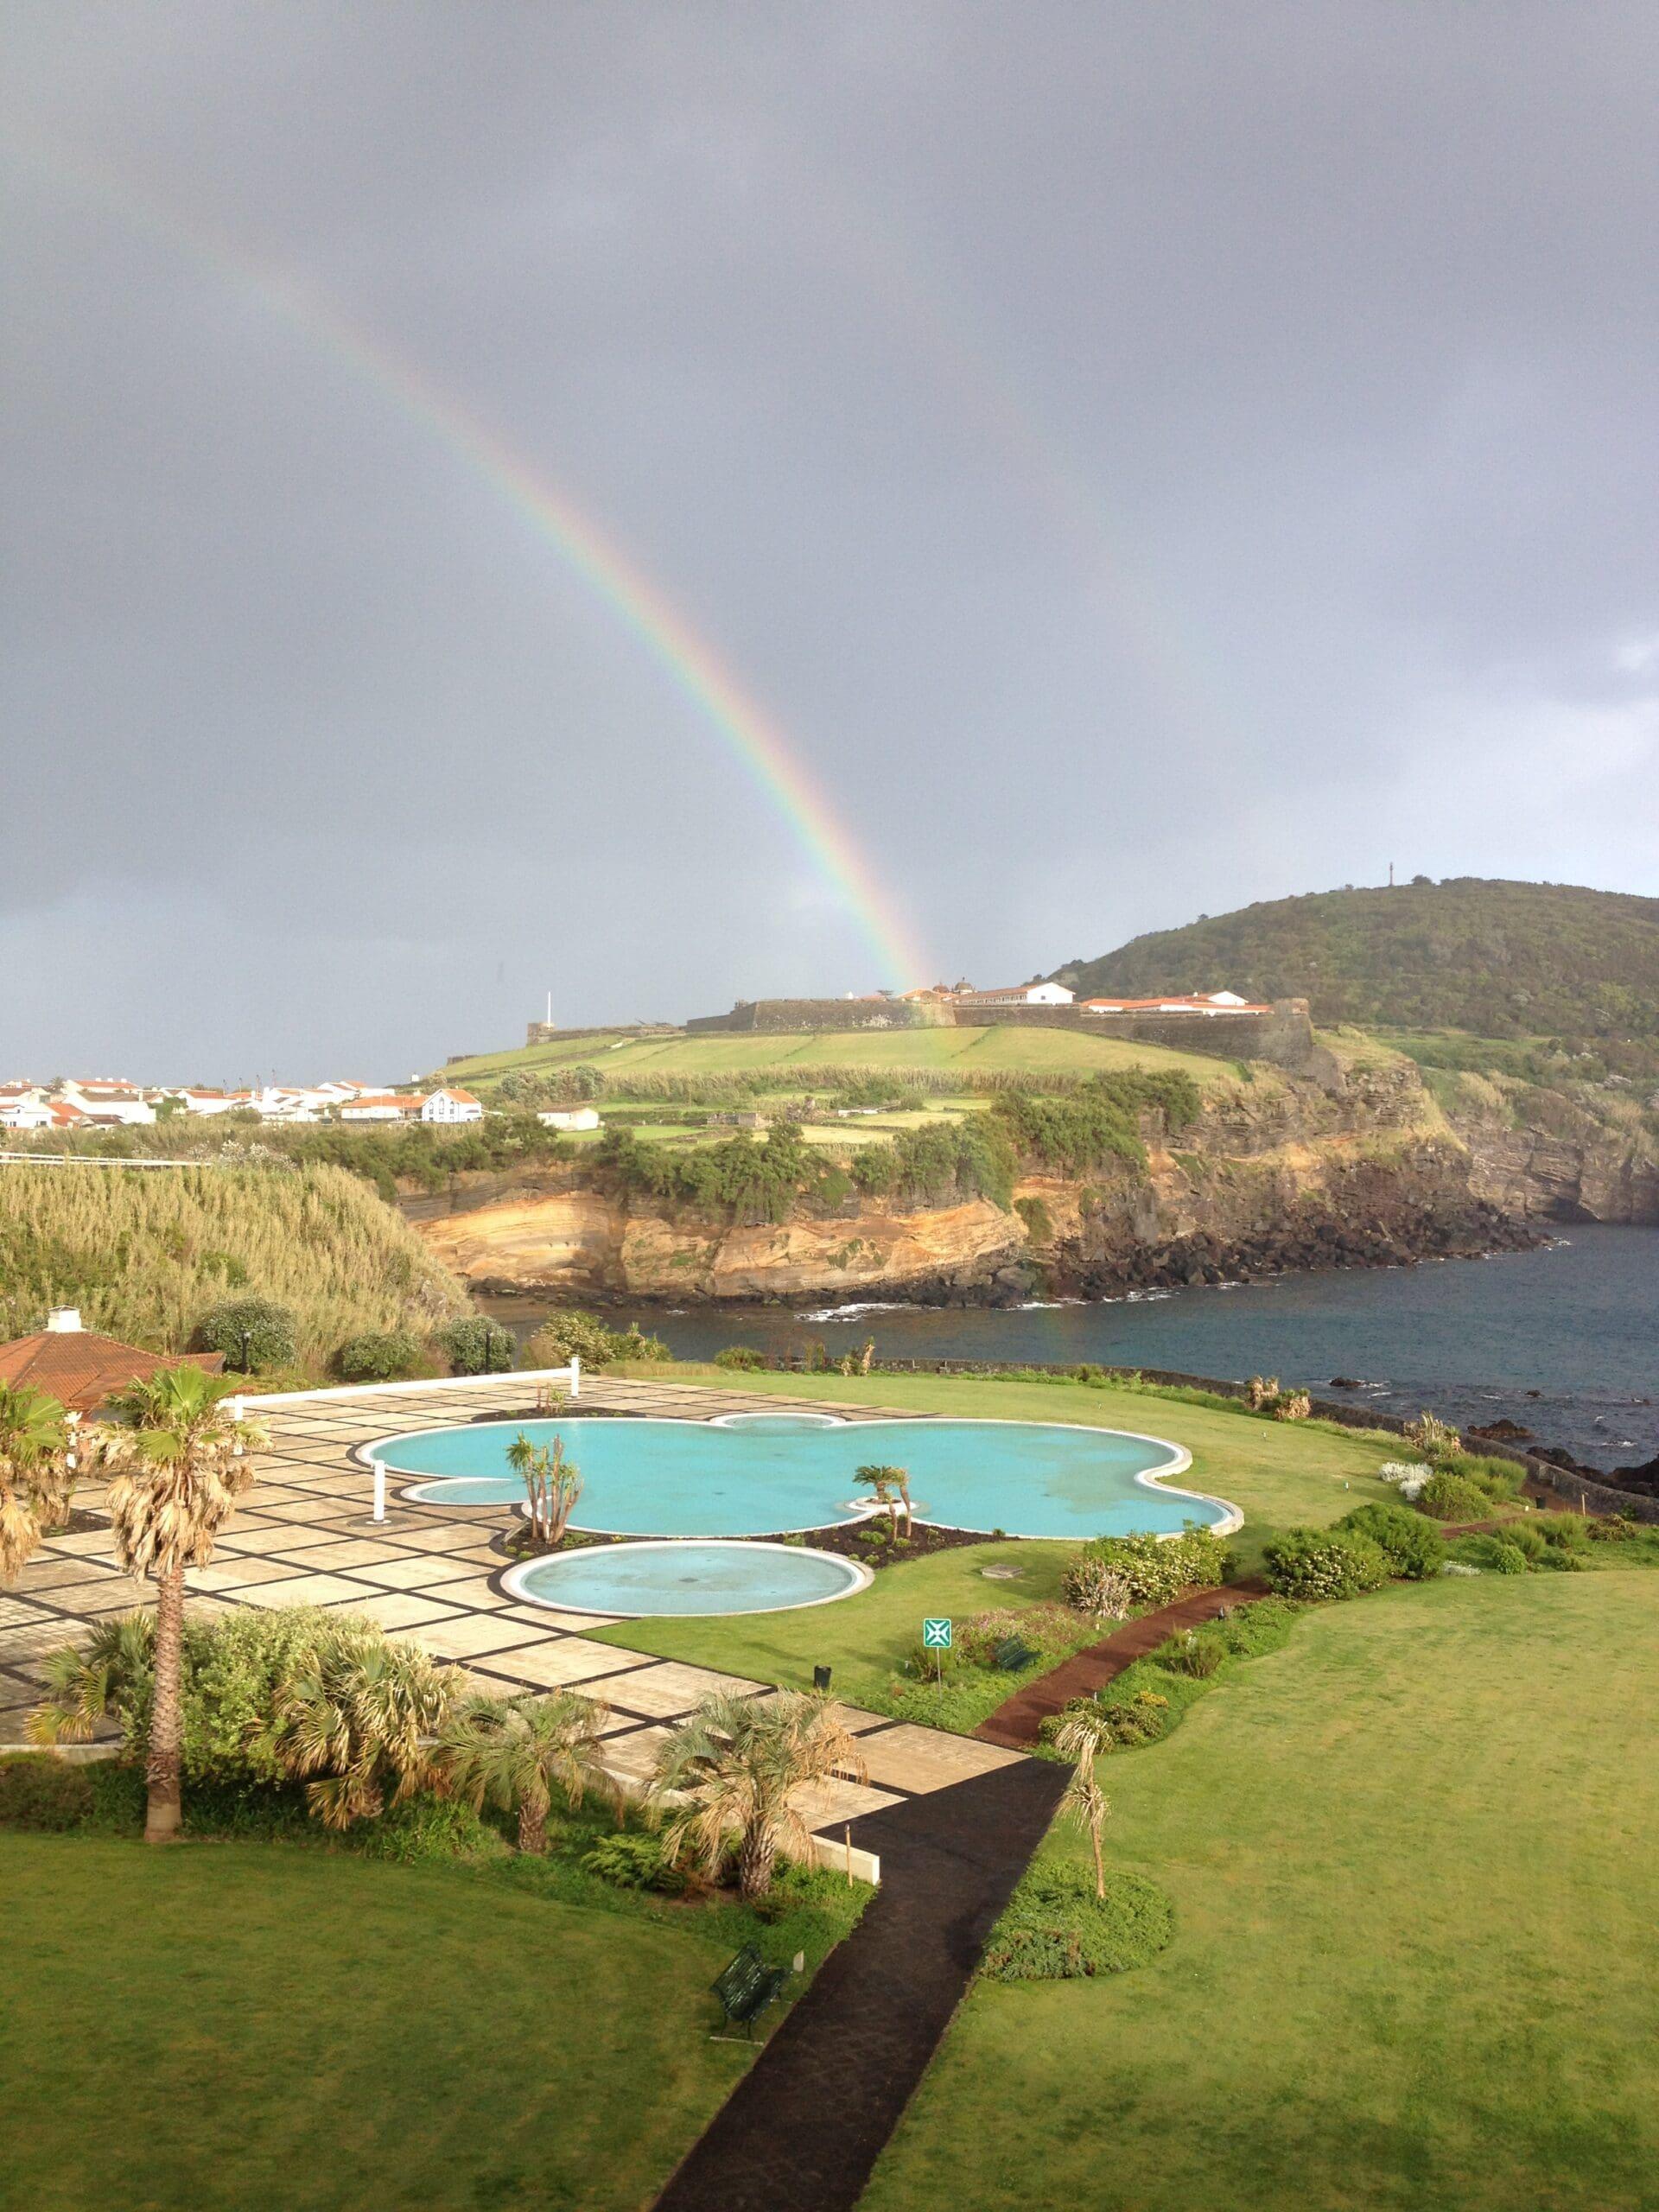 rainbowazores holidays the coach holiday expert #thecoachholidayexpert